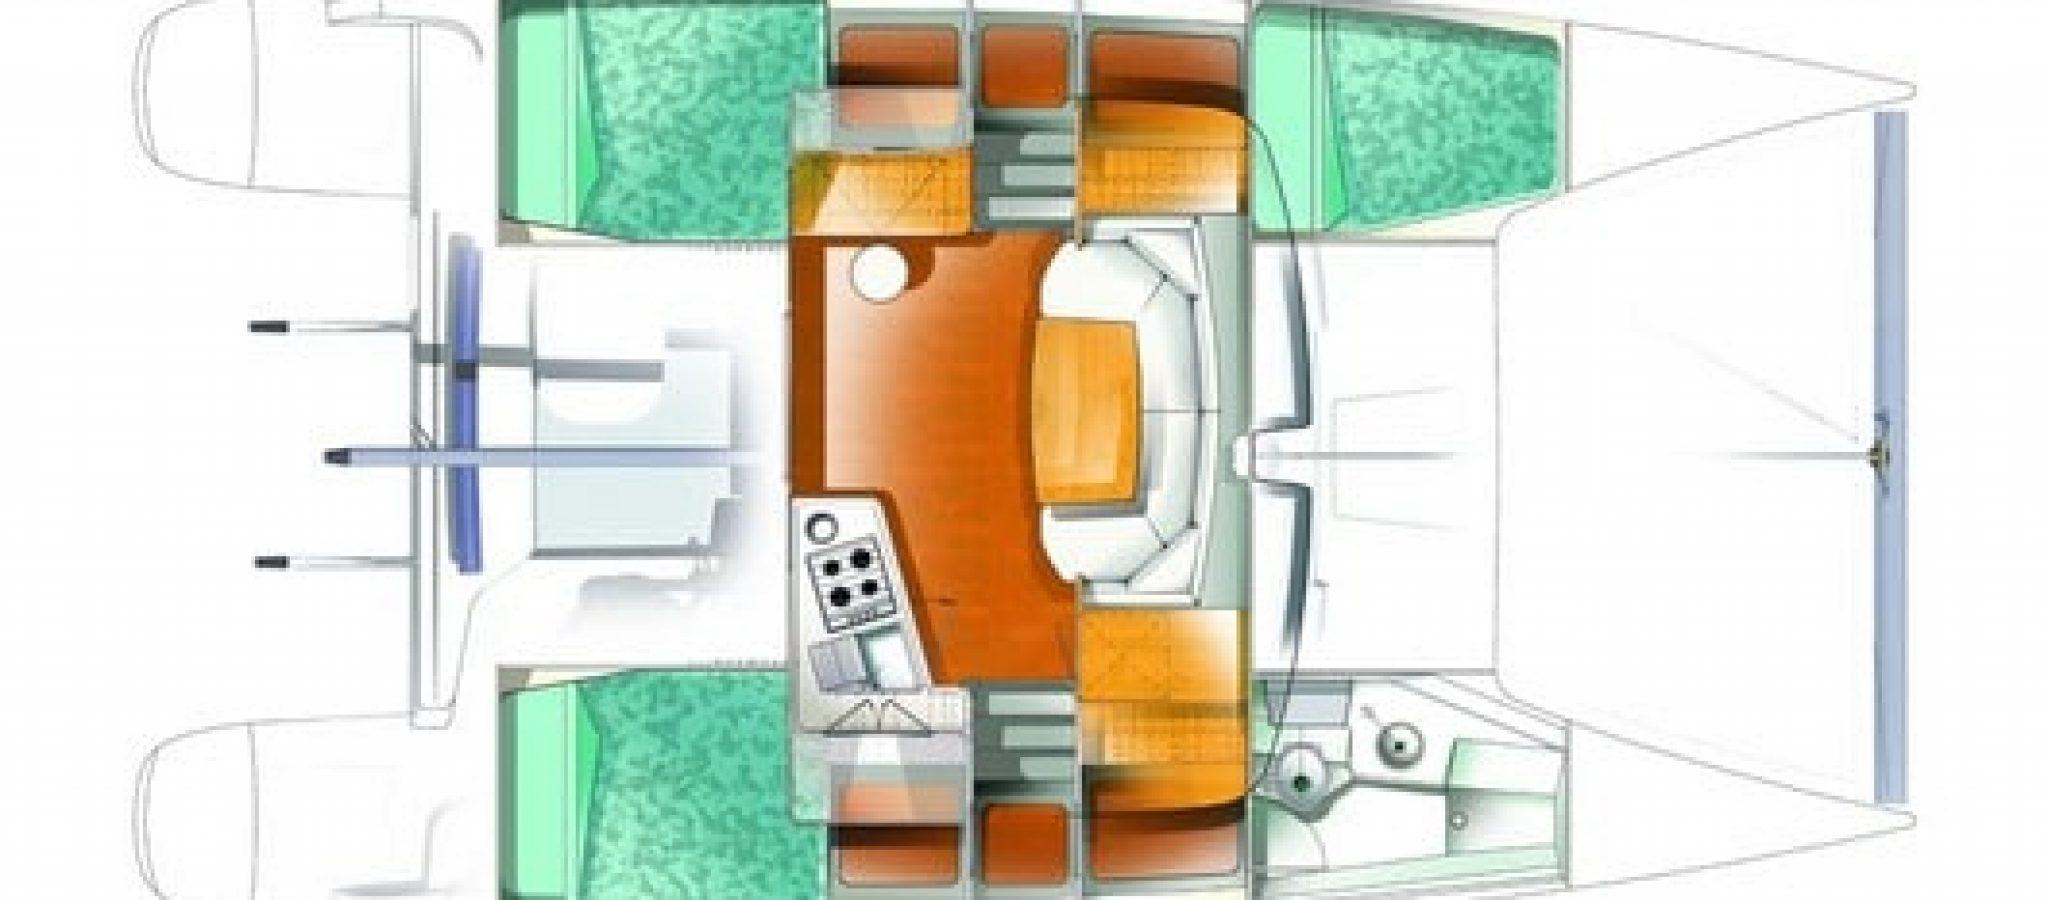 FP Mahe 36 plan 3 cabines